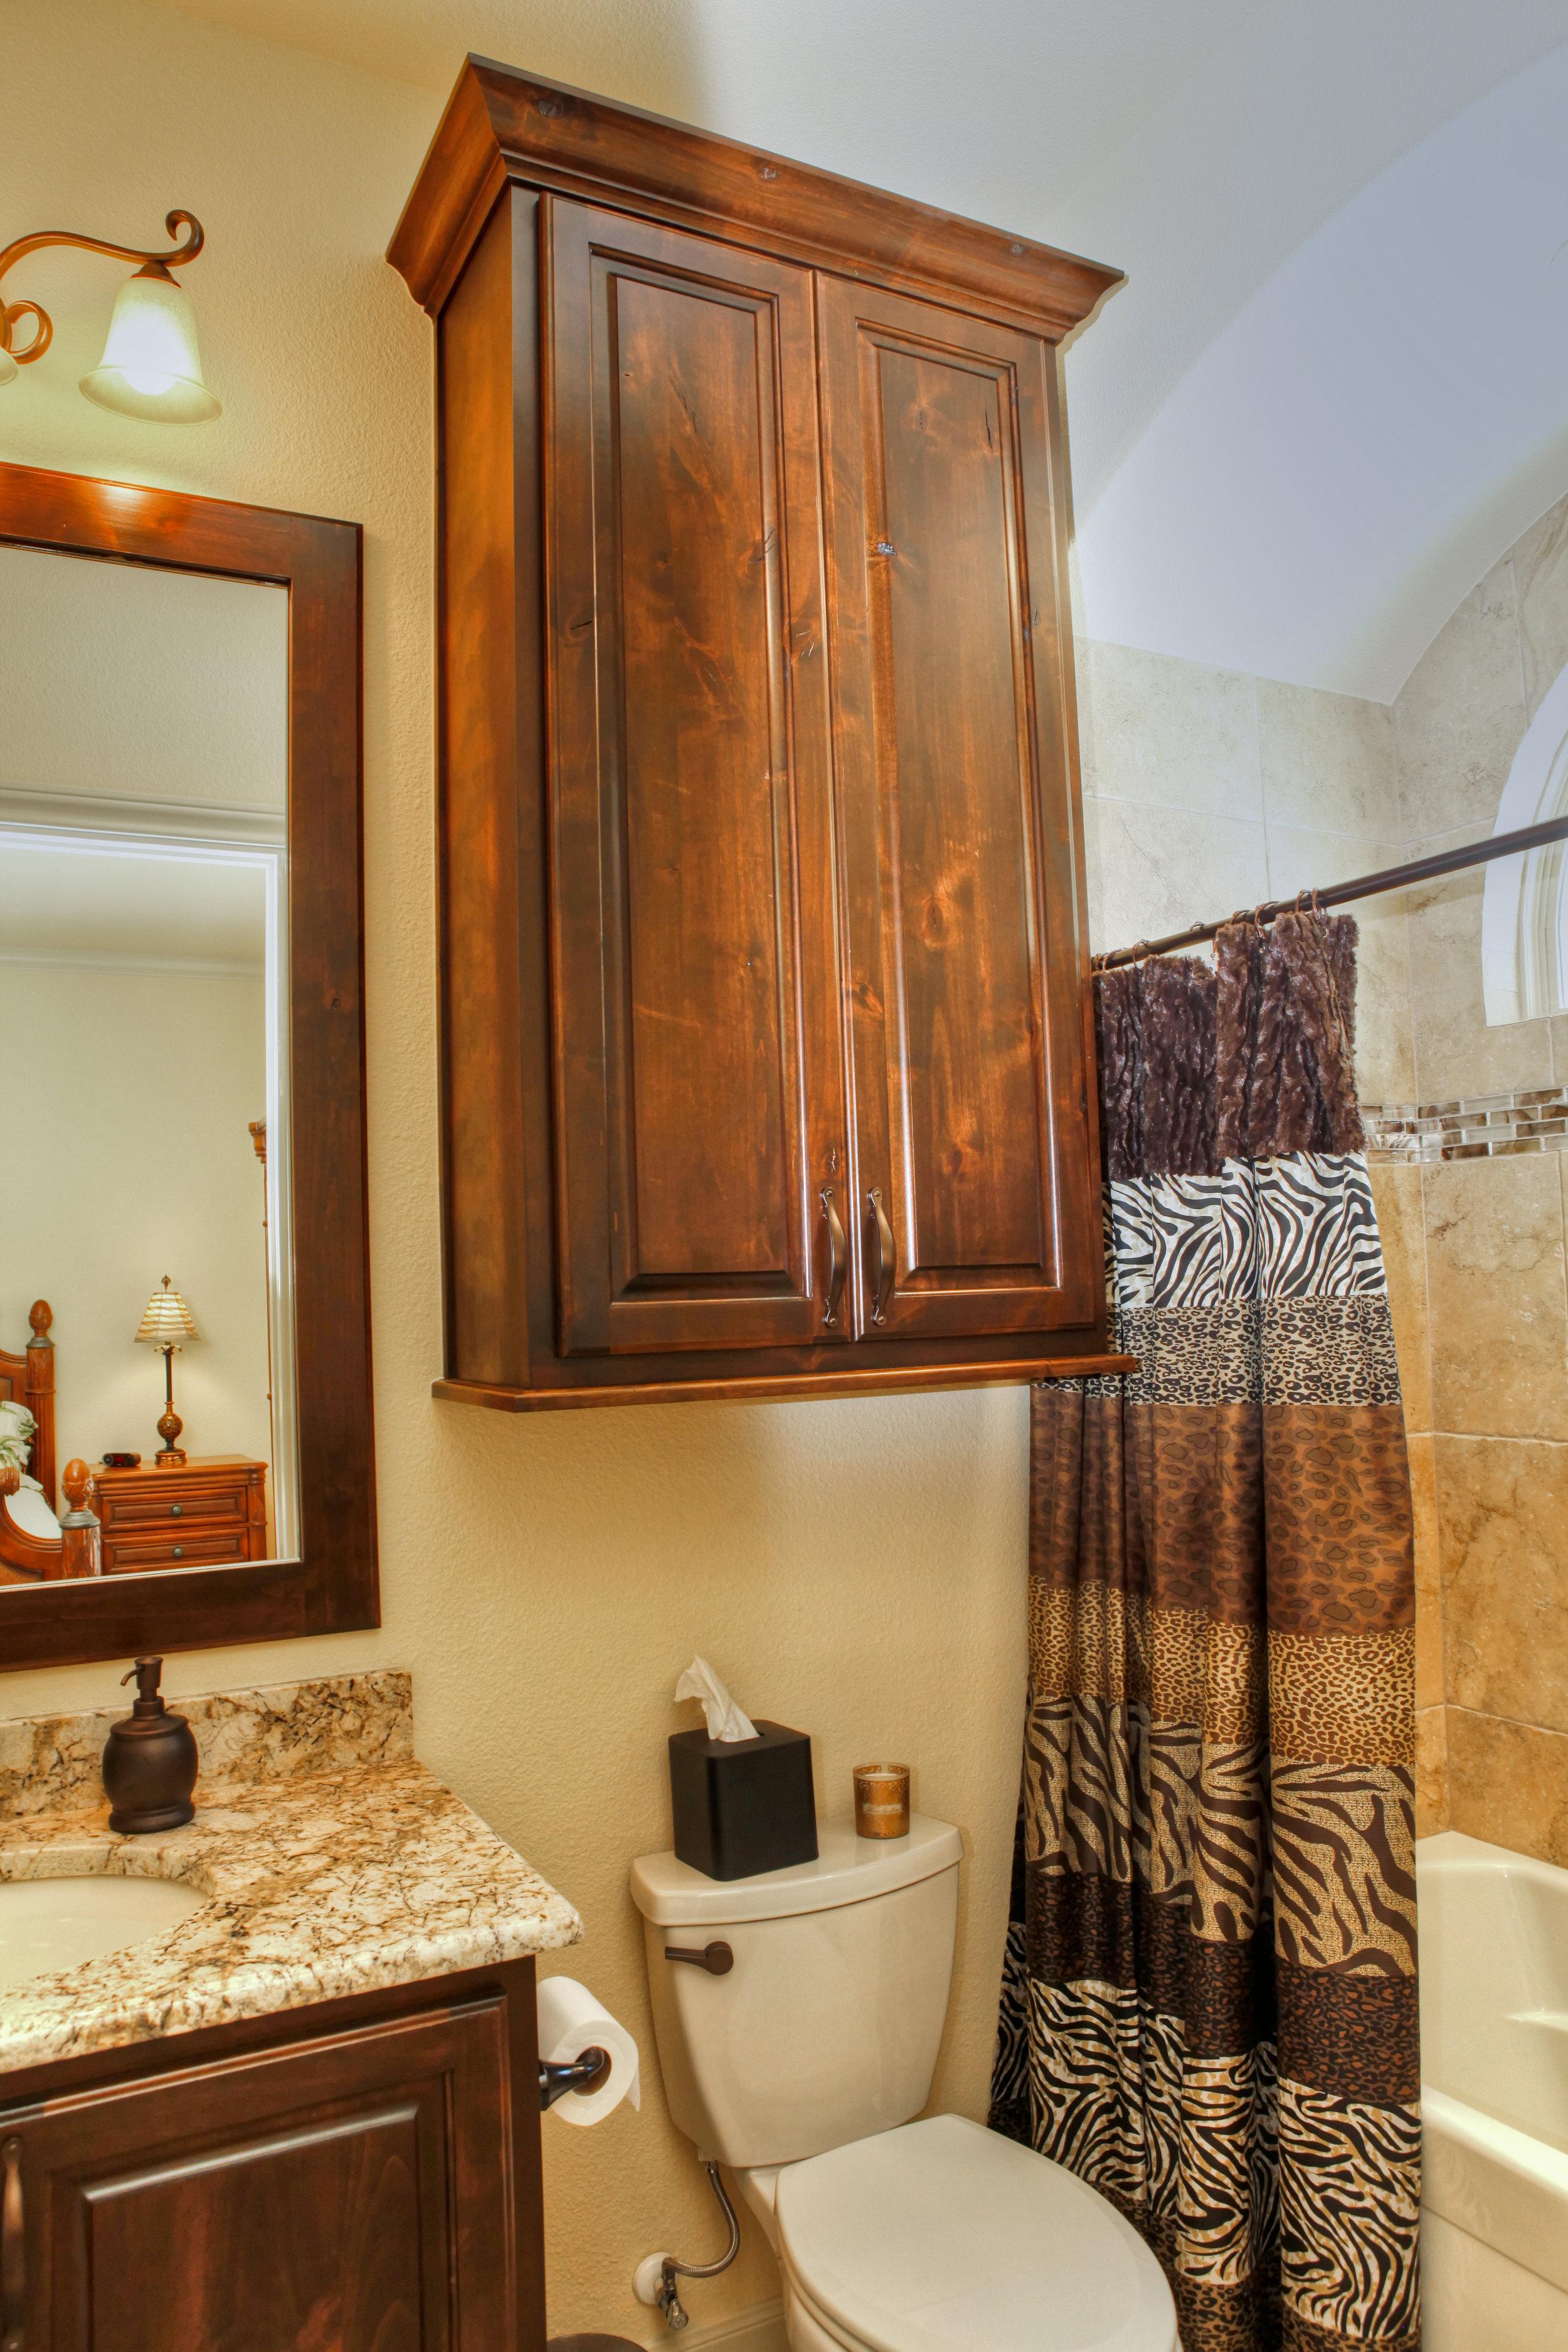 22-guest bath 1.jpg